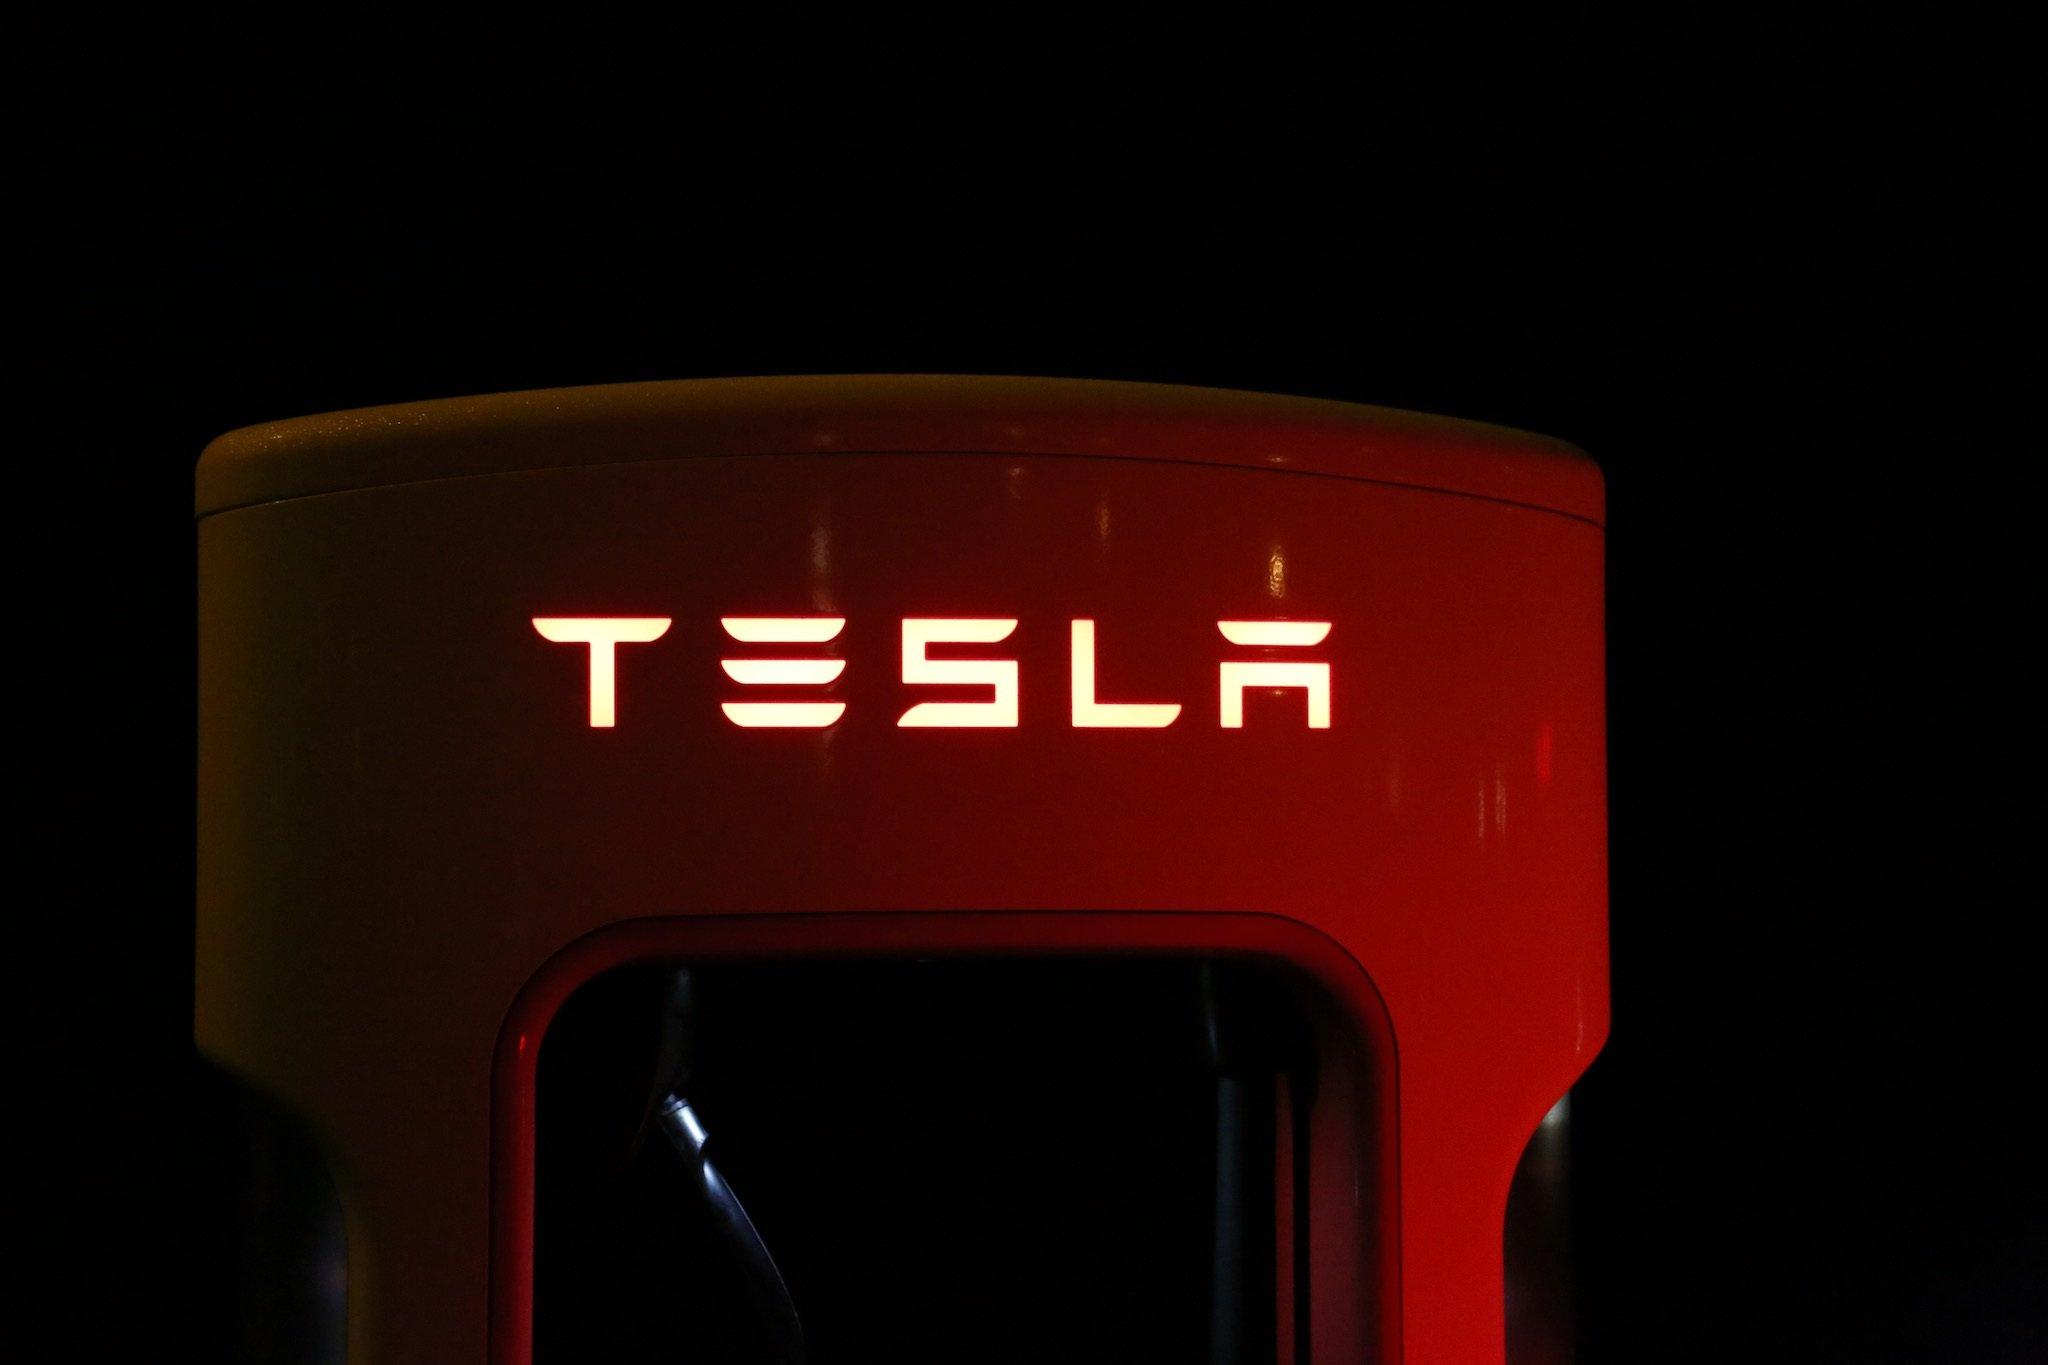 258083_Tesla_Charger_Pexles-Pixabay